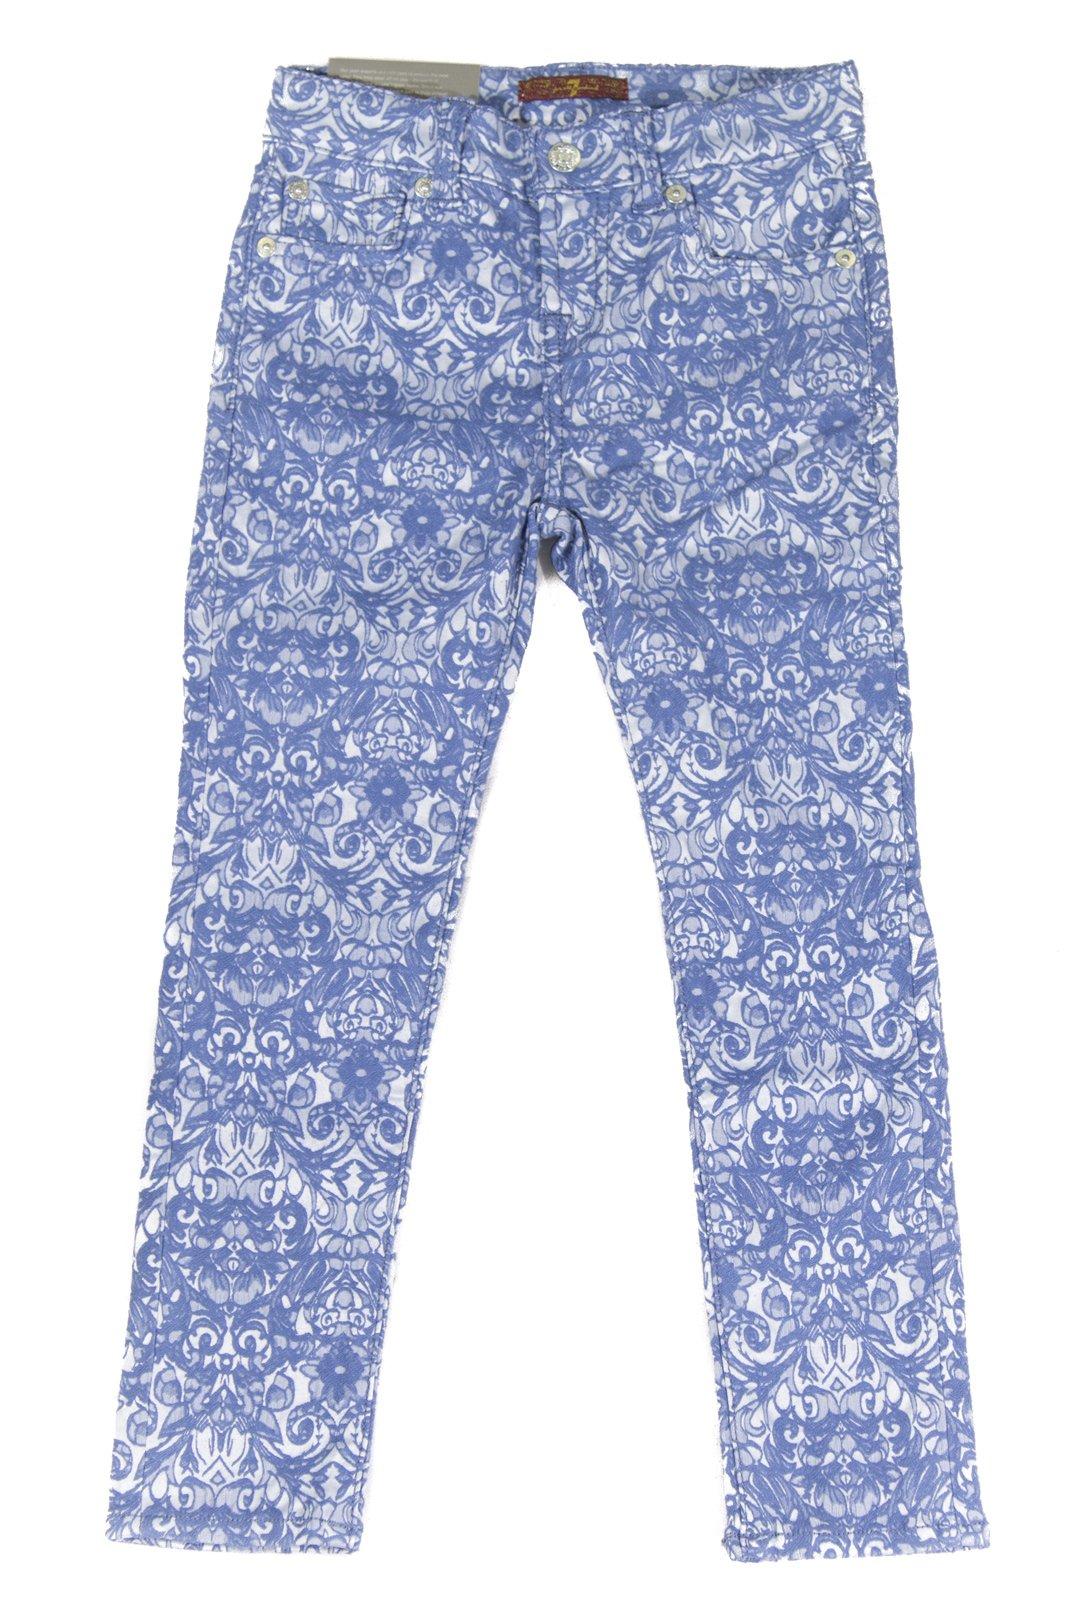 7 For All Mankind Girl's Skinny Legging Jeans 7FFXG2162, 8 Moroccan Blue Jacquard